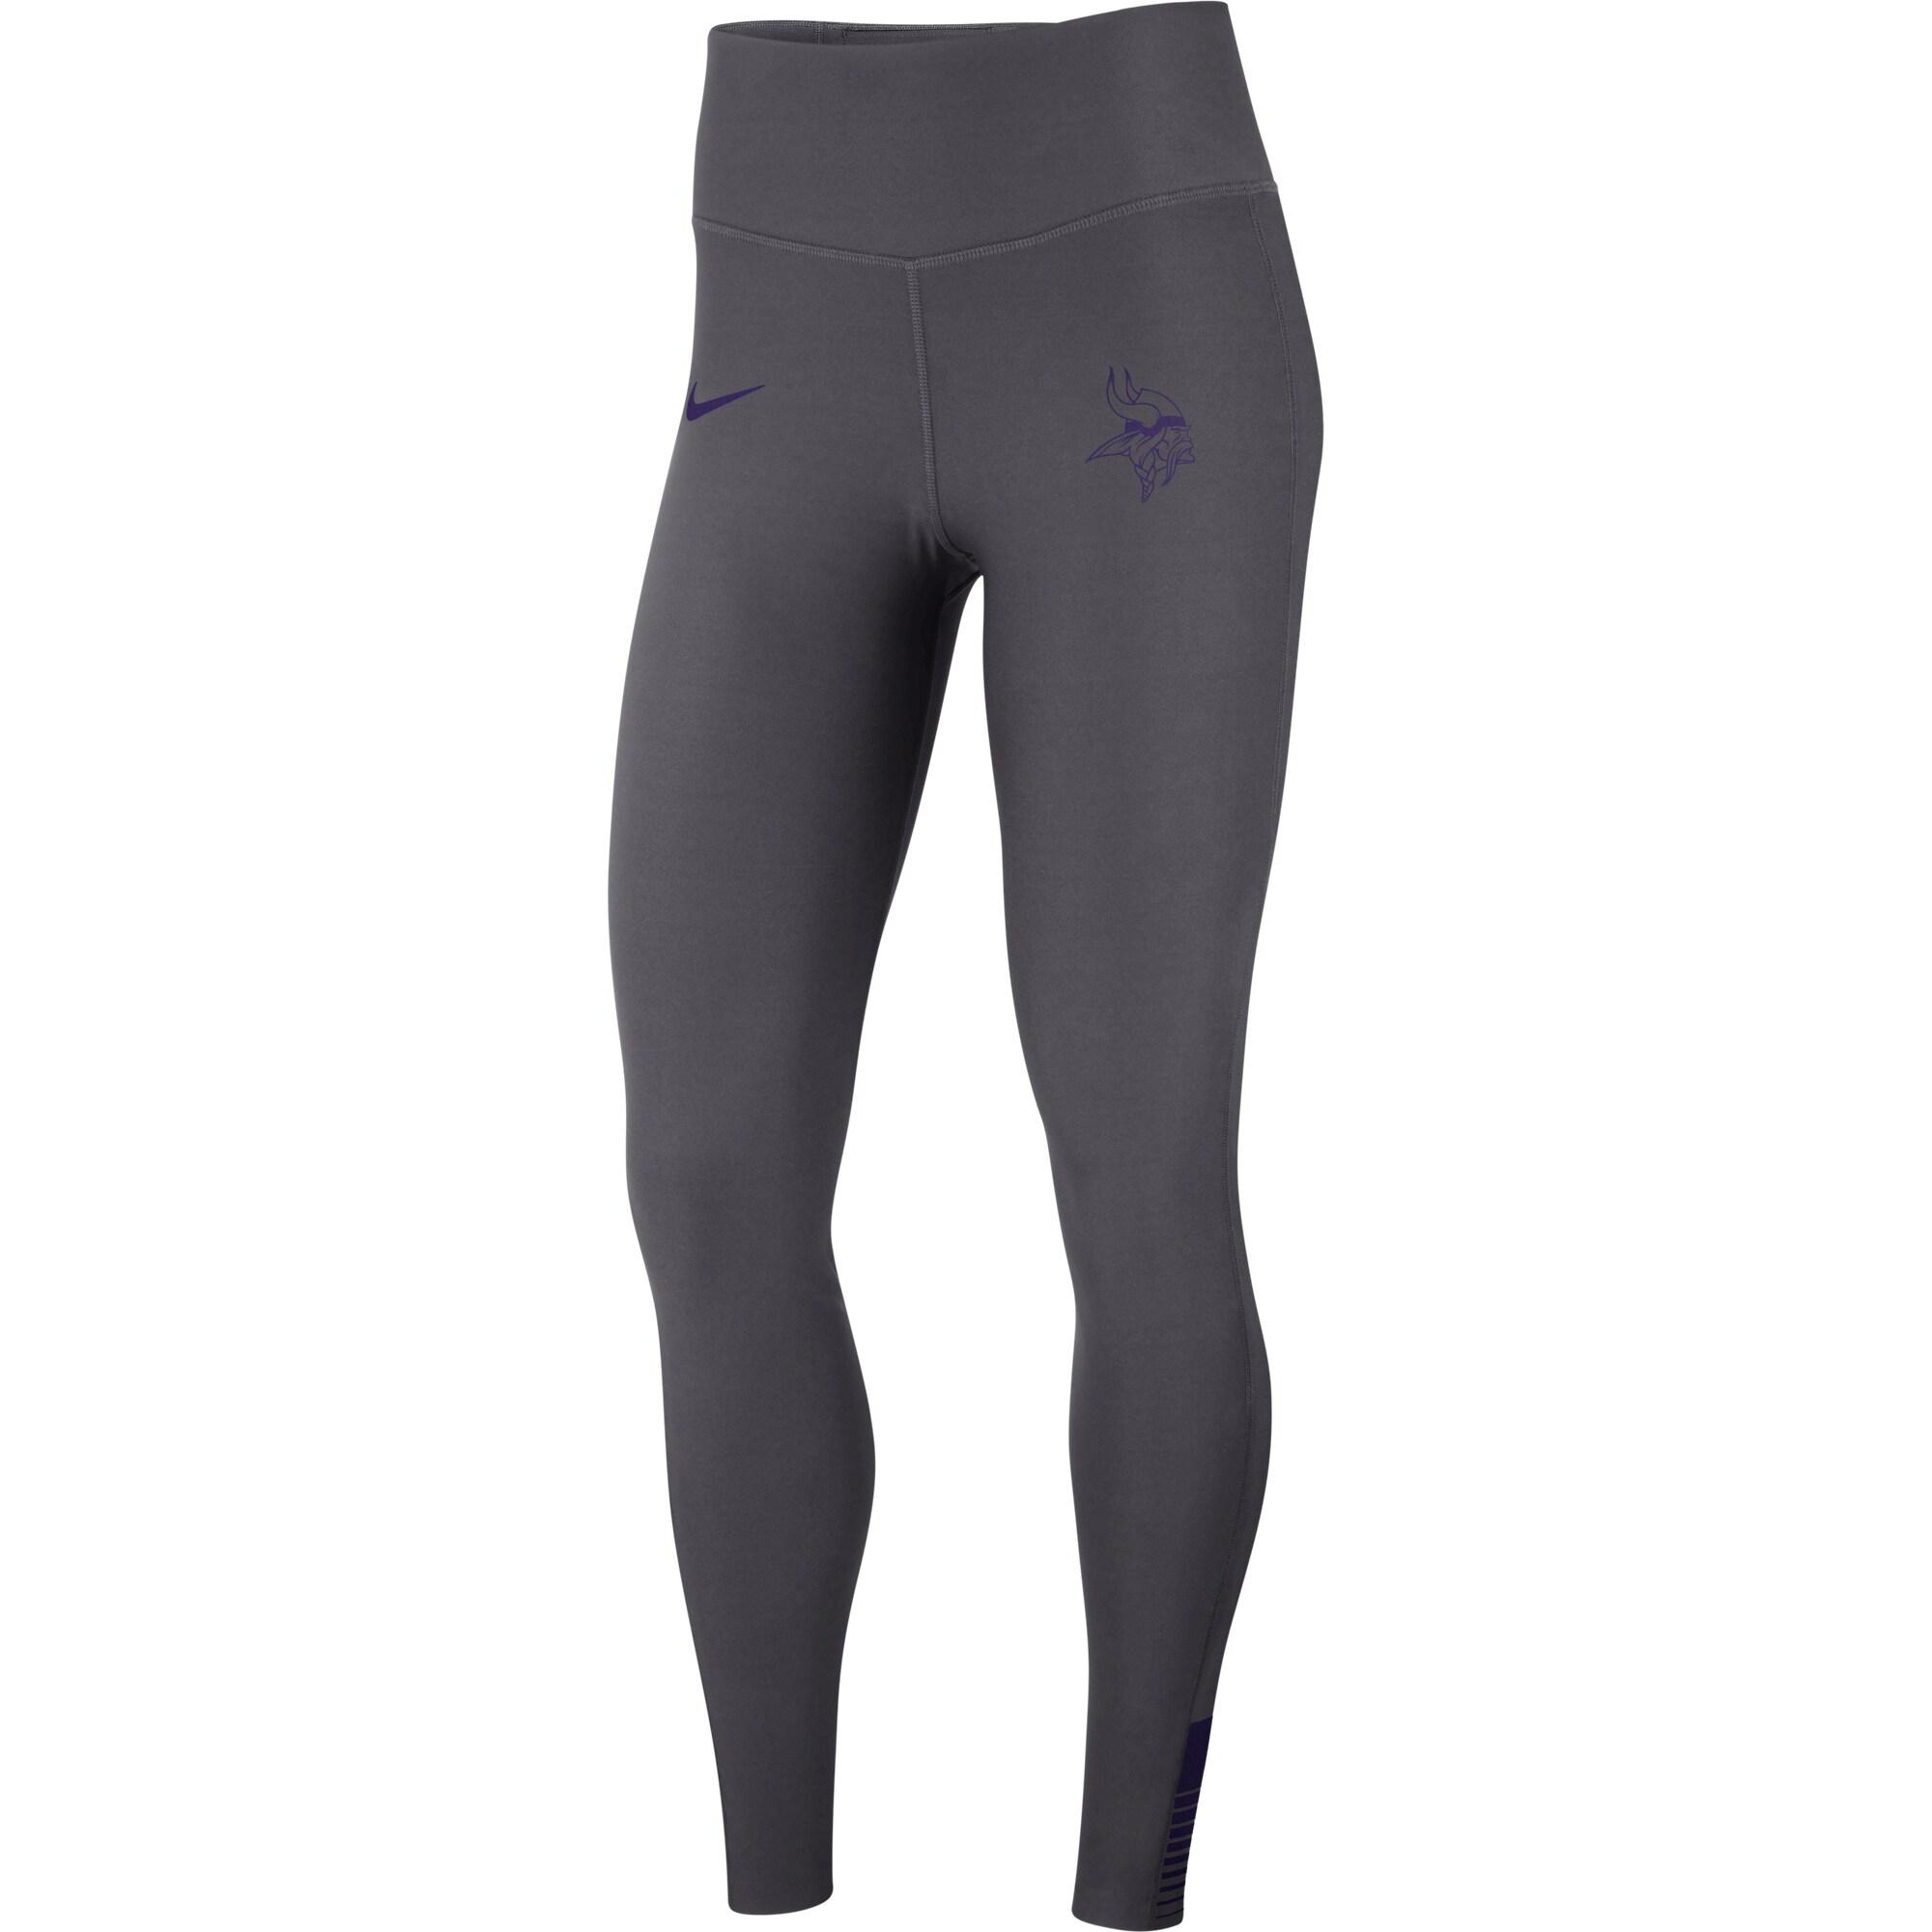 Minnesota Vikings Nike Women's Power Sculpt Leggings - Gray